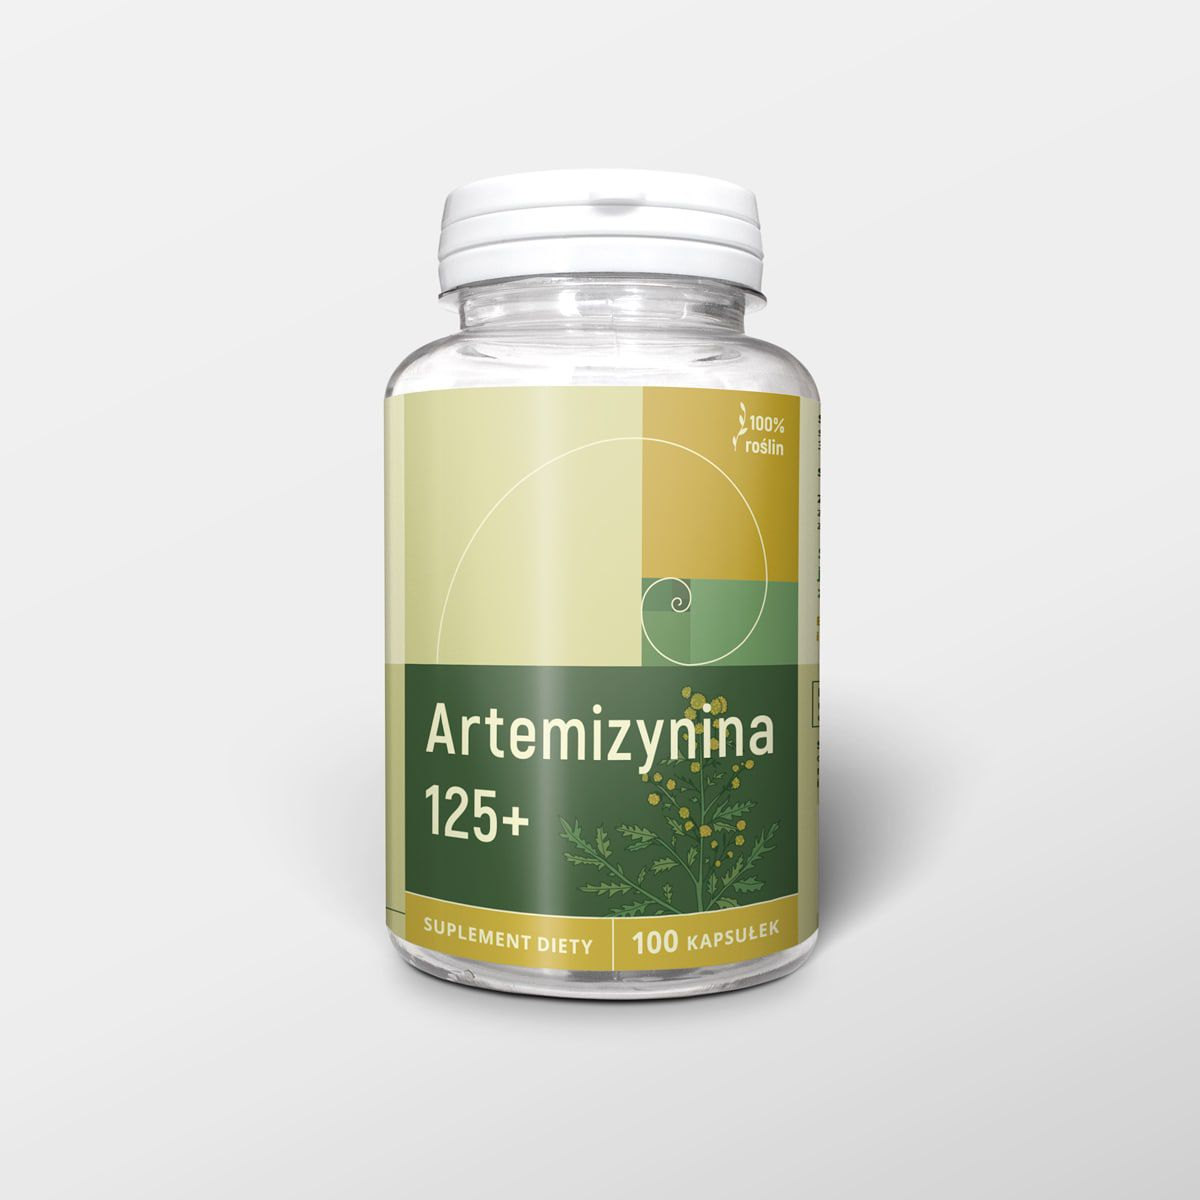 Artemizynina 125+ 100 kapsułek x 500 mg